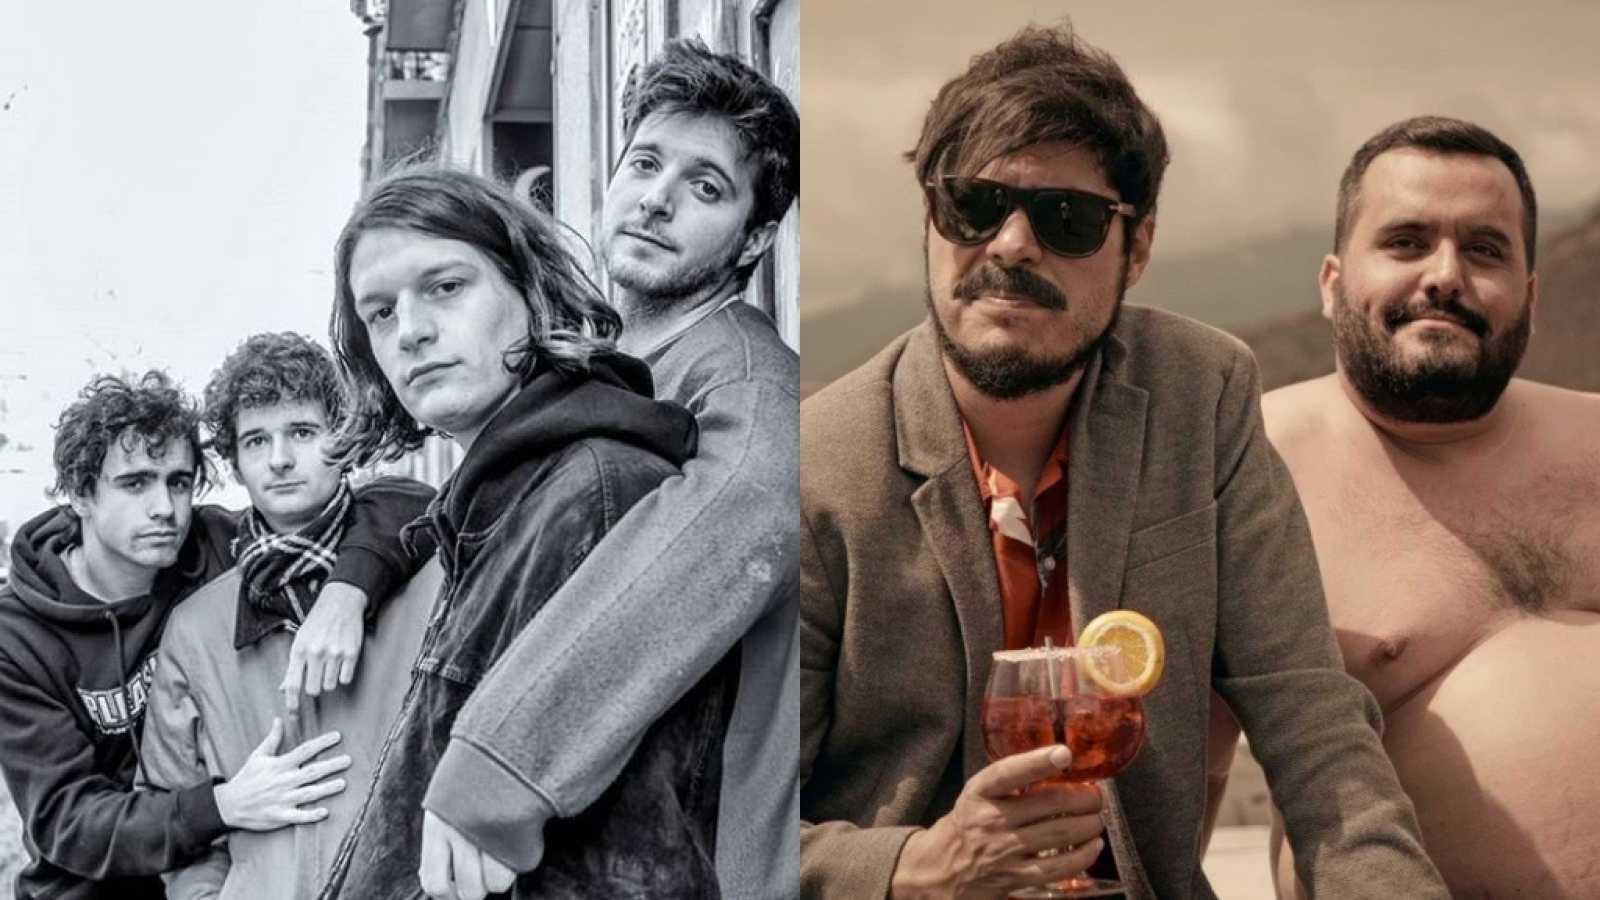 Carolina Durante, Leîti Sene, David Sainz y Kike Pérez y las protagonistas de 'Valeria', los invitados de la semana de 'OK Playz'